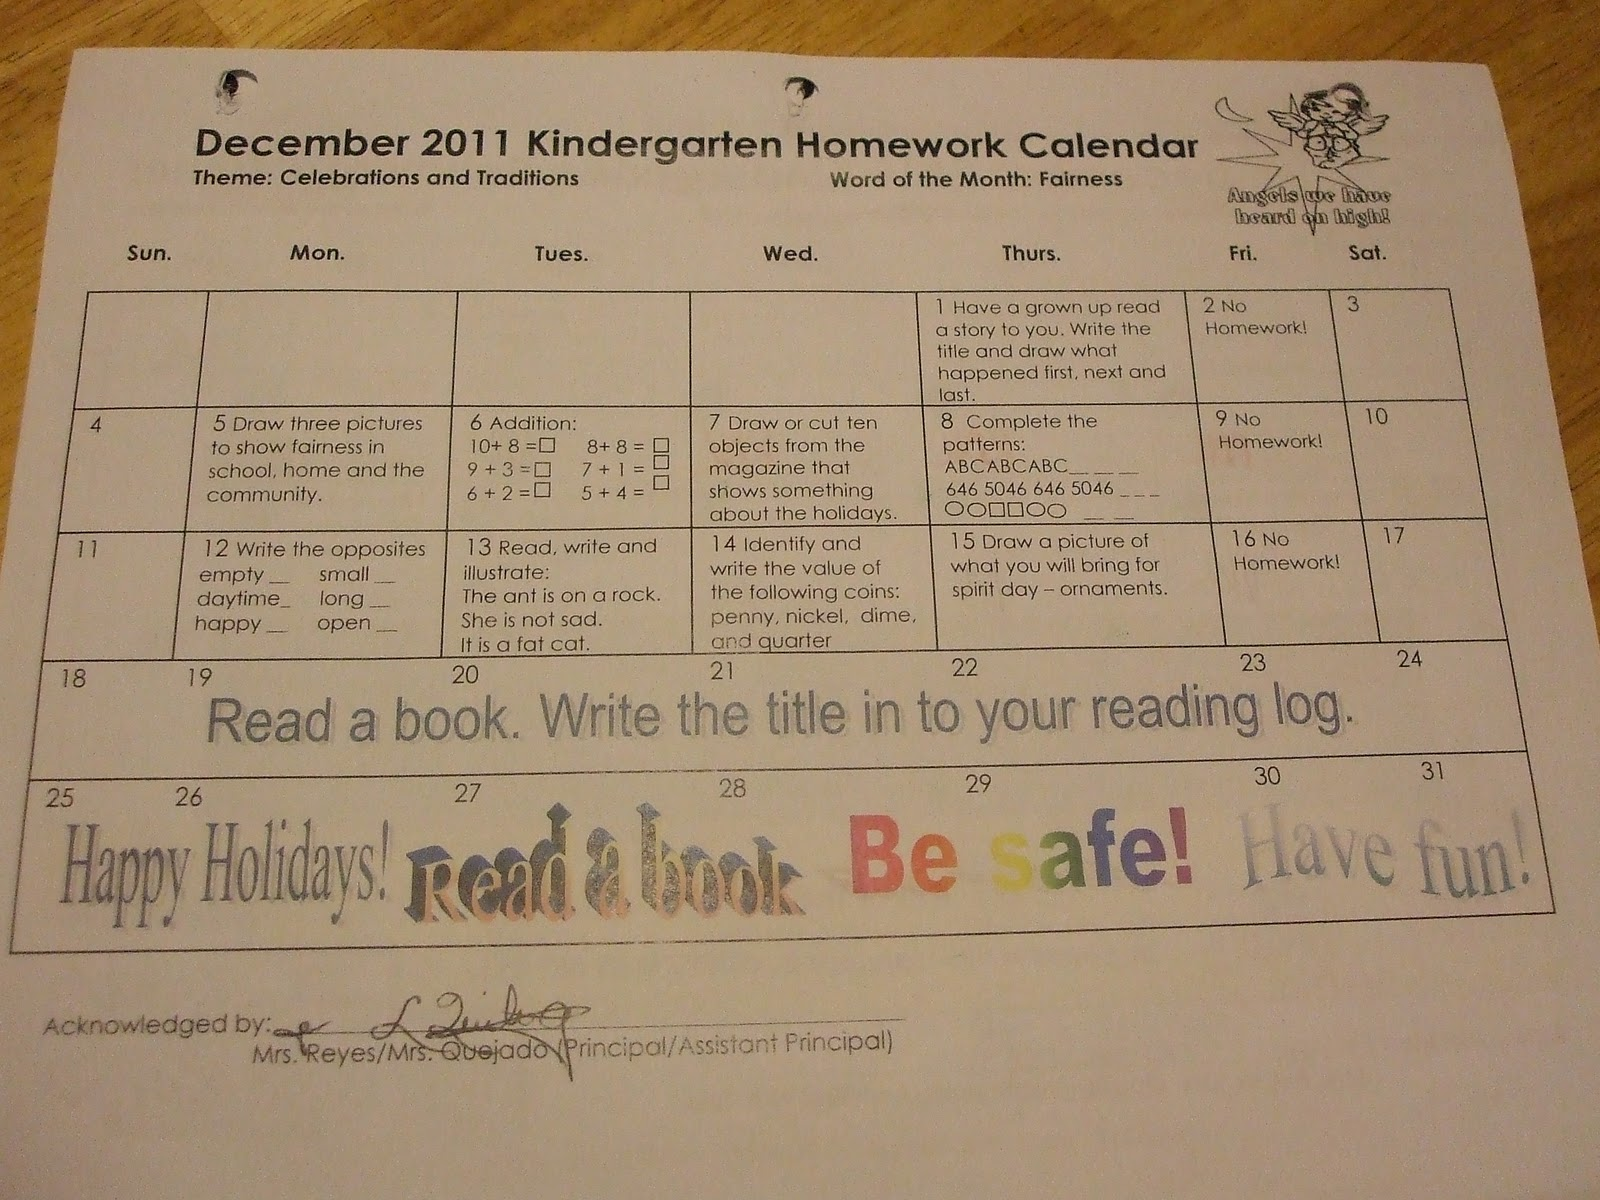 December Calendar Art Kindergarten : Kindergarten news at lbj february